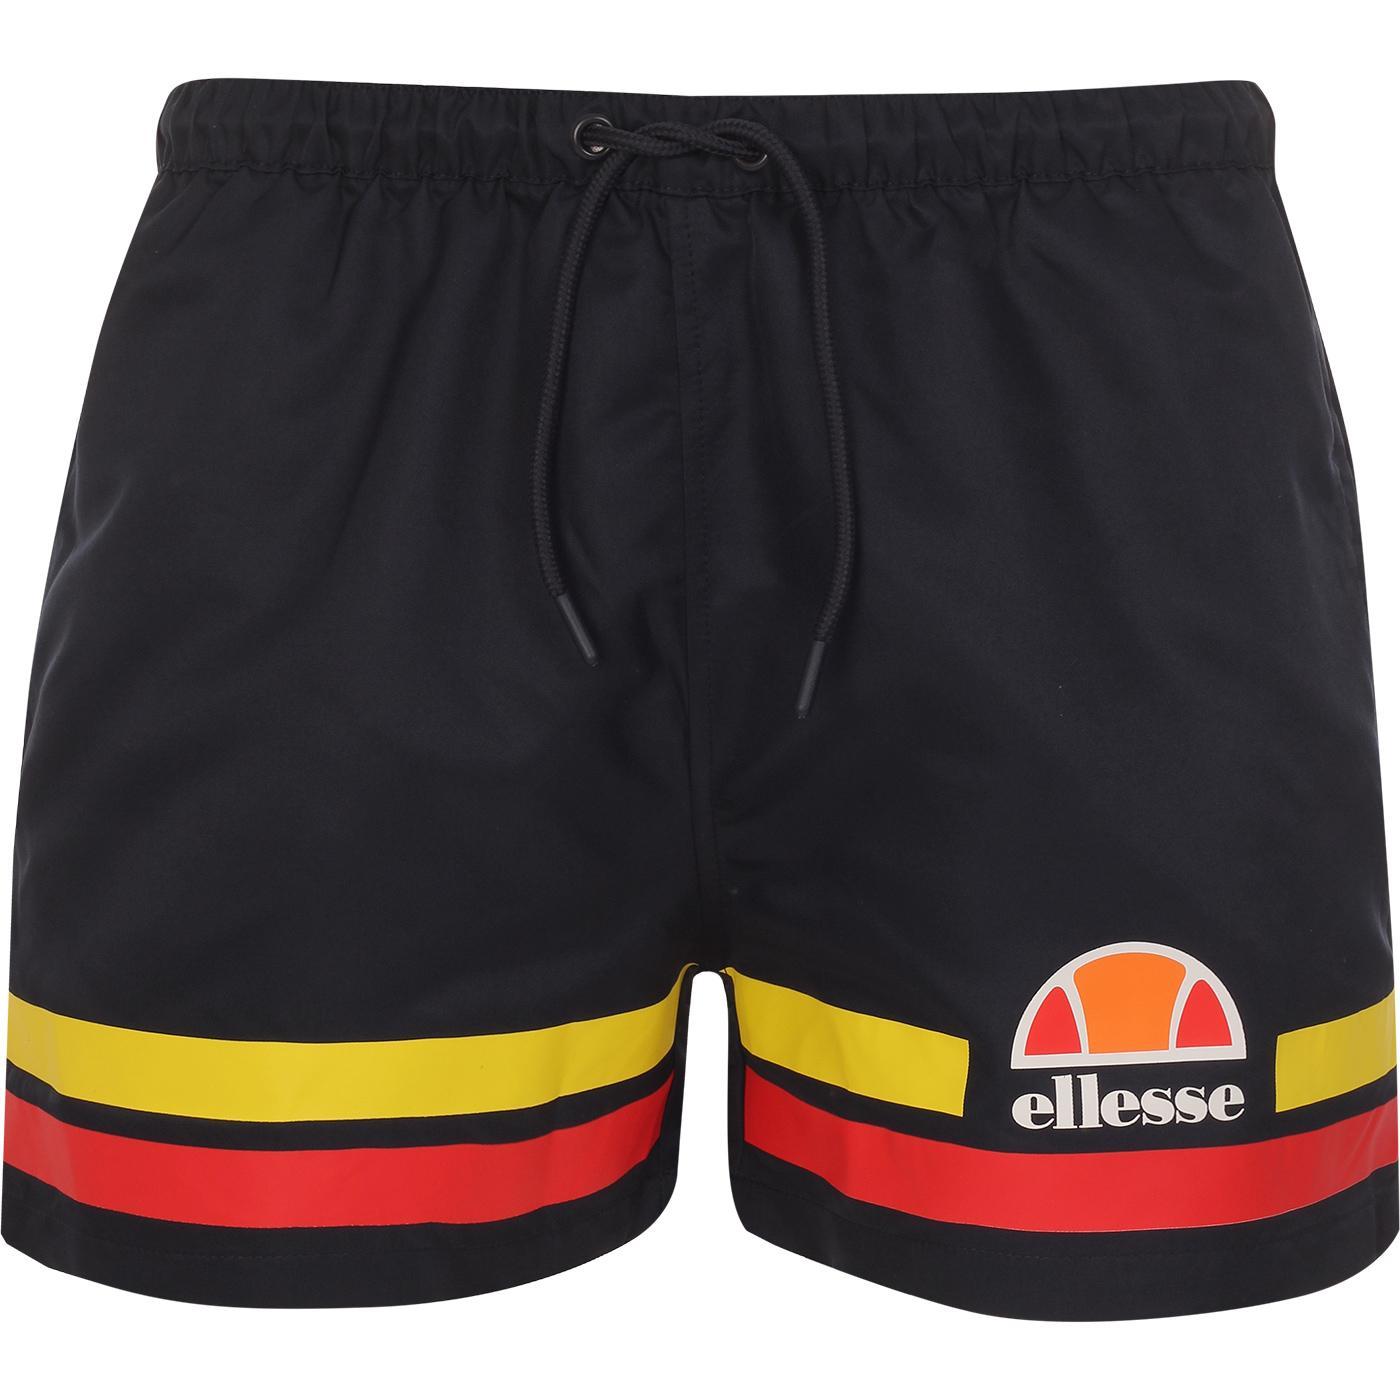 Tello ELLESSE Retro Stripe Swim Shorts (Spain)